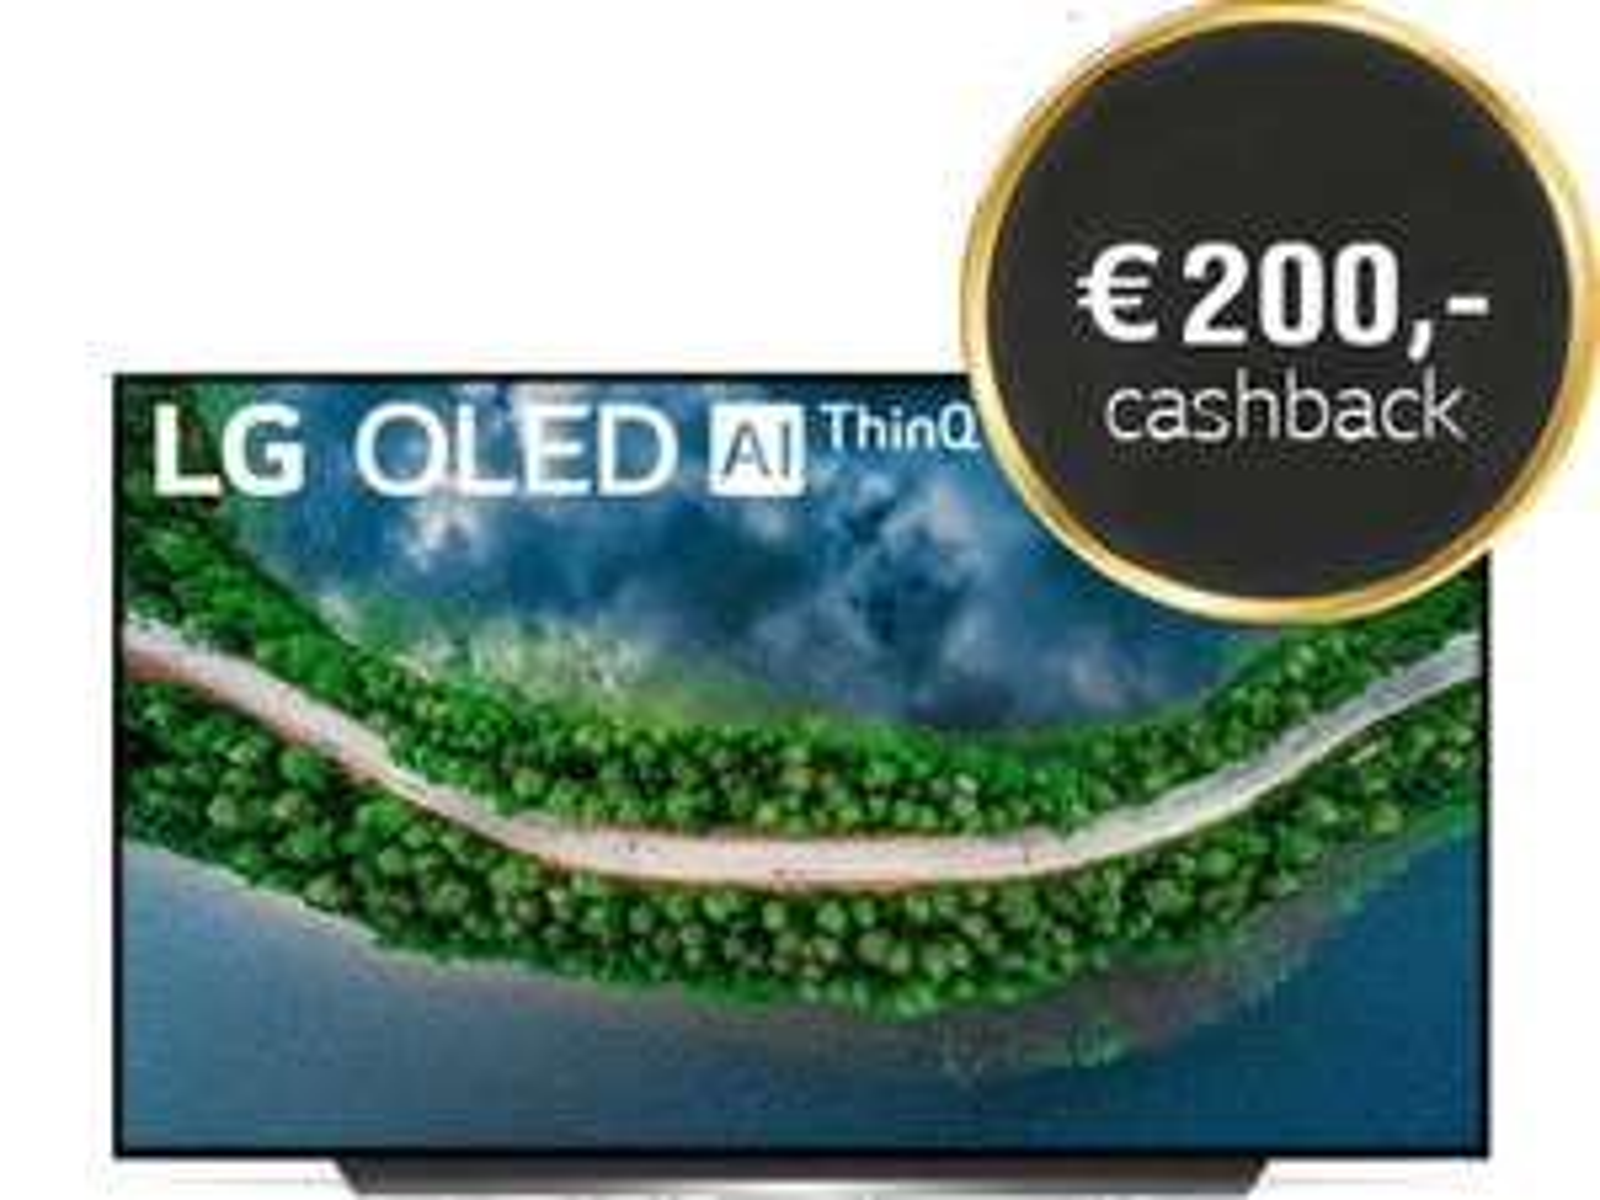 LG CX OLED 65 inch @ ING